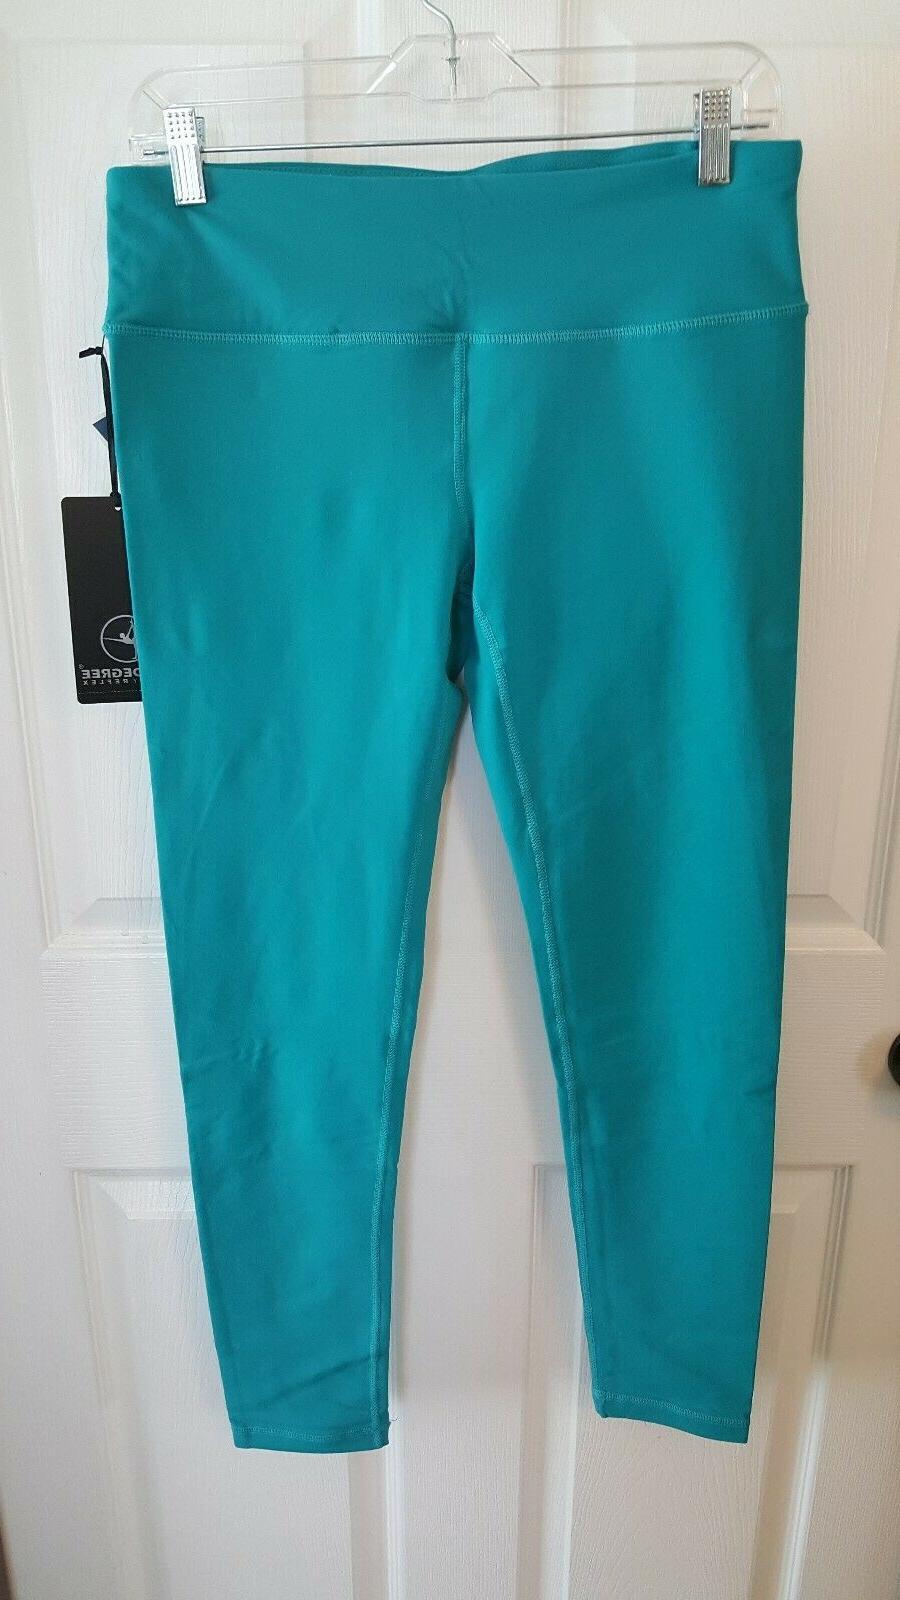 nwt 90 degree by reflex blue activewear